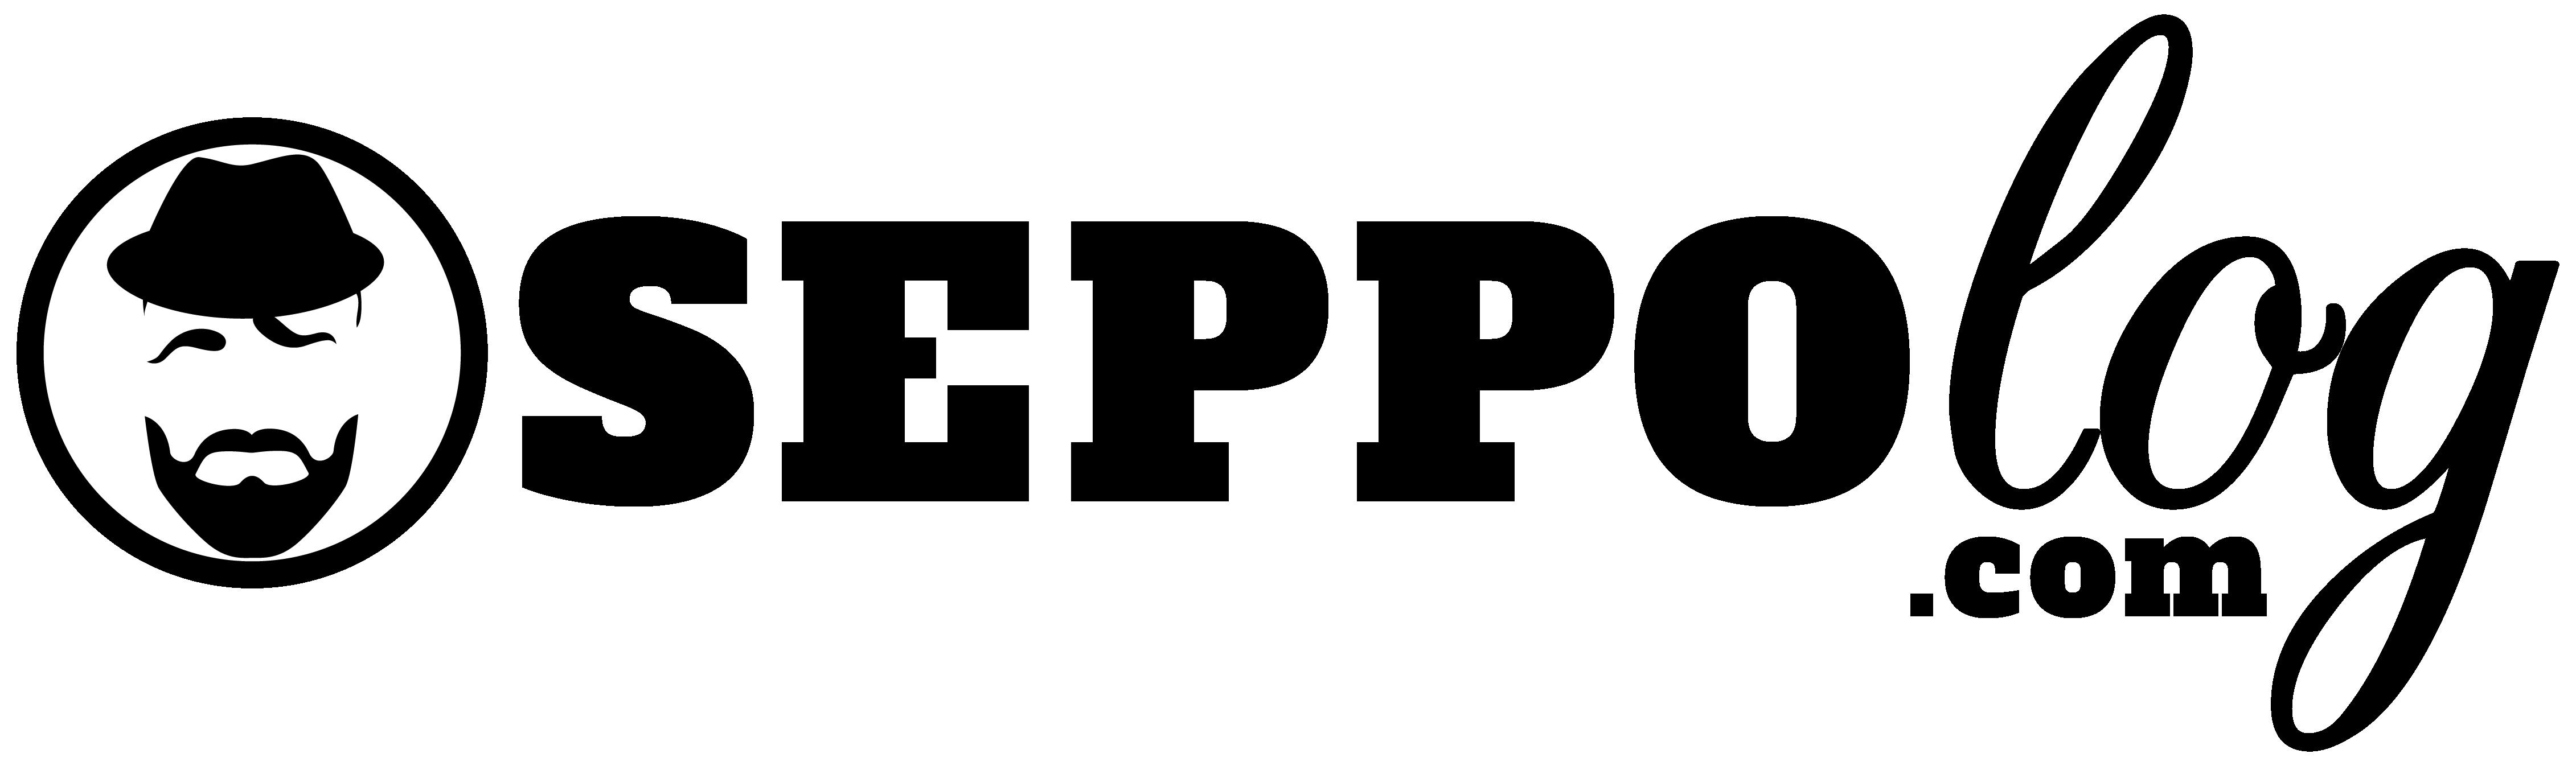 seppolog